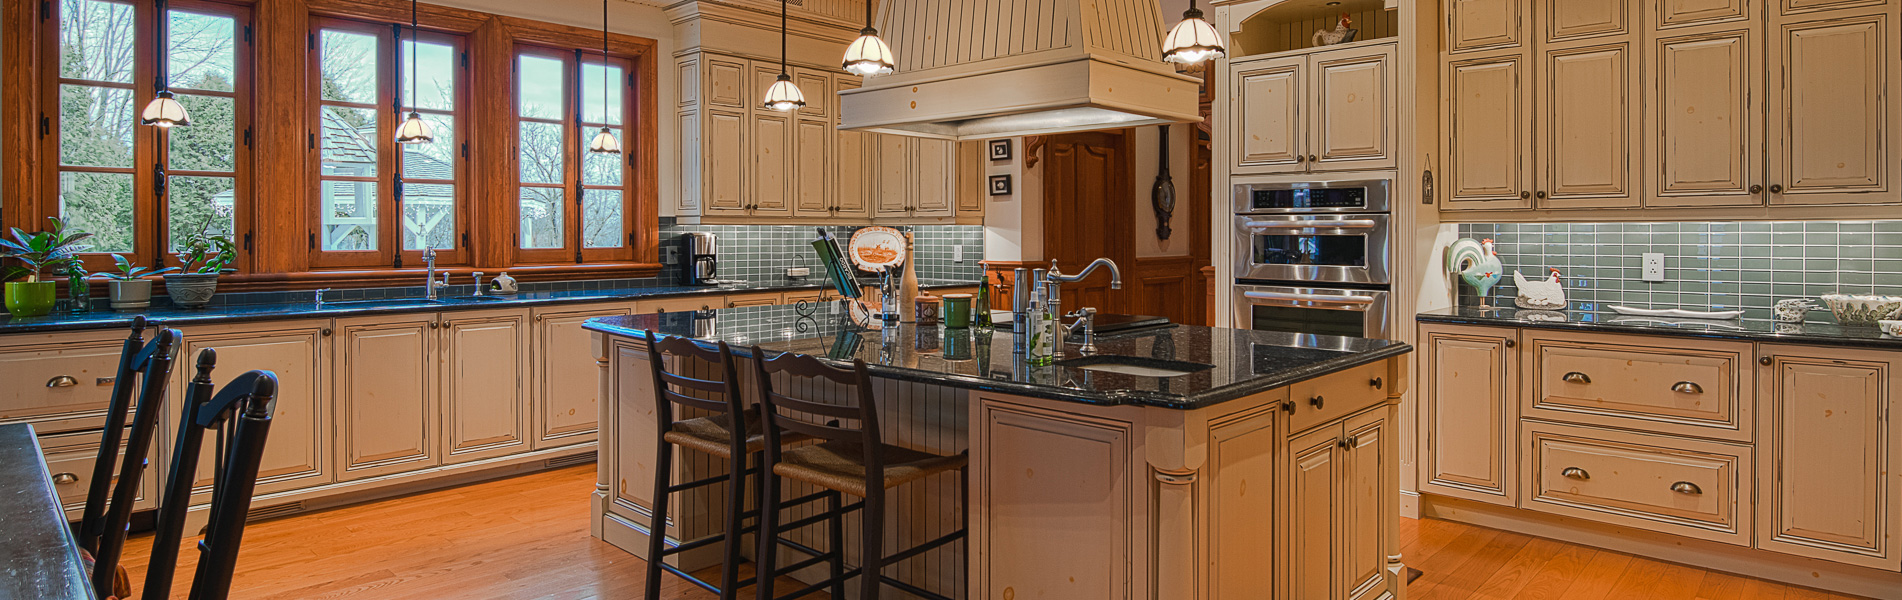 latest comptoir bois cuisine with comptoir bois cuisine. Black Bedroom Furniture Sets. Home Design Ideas